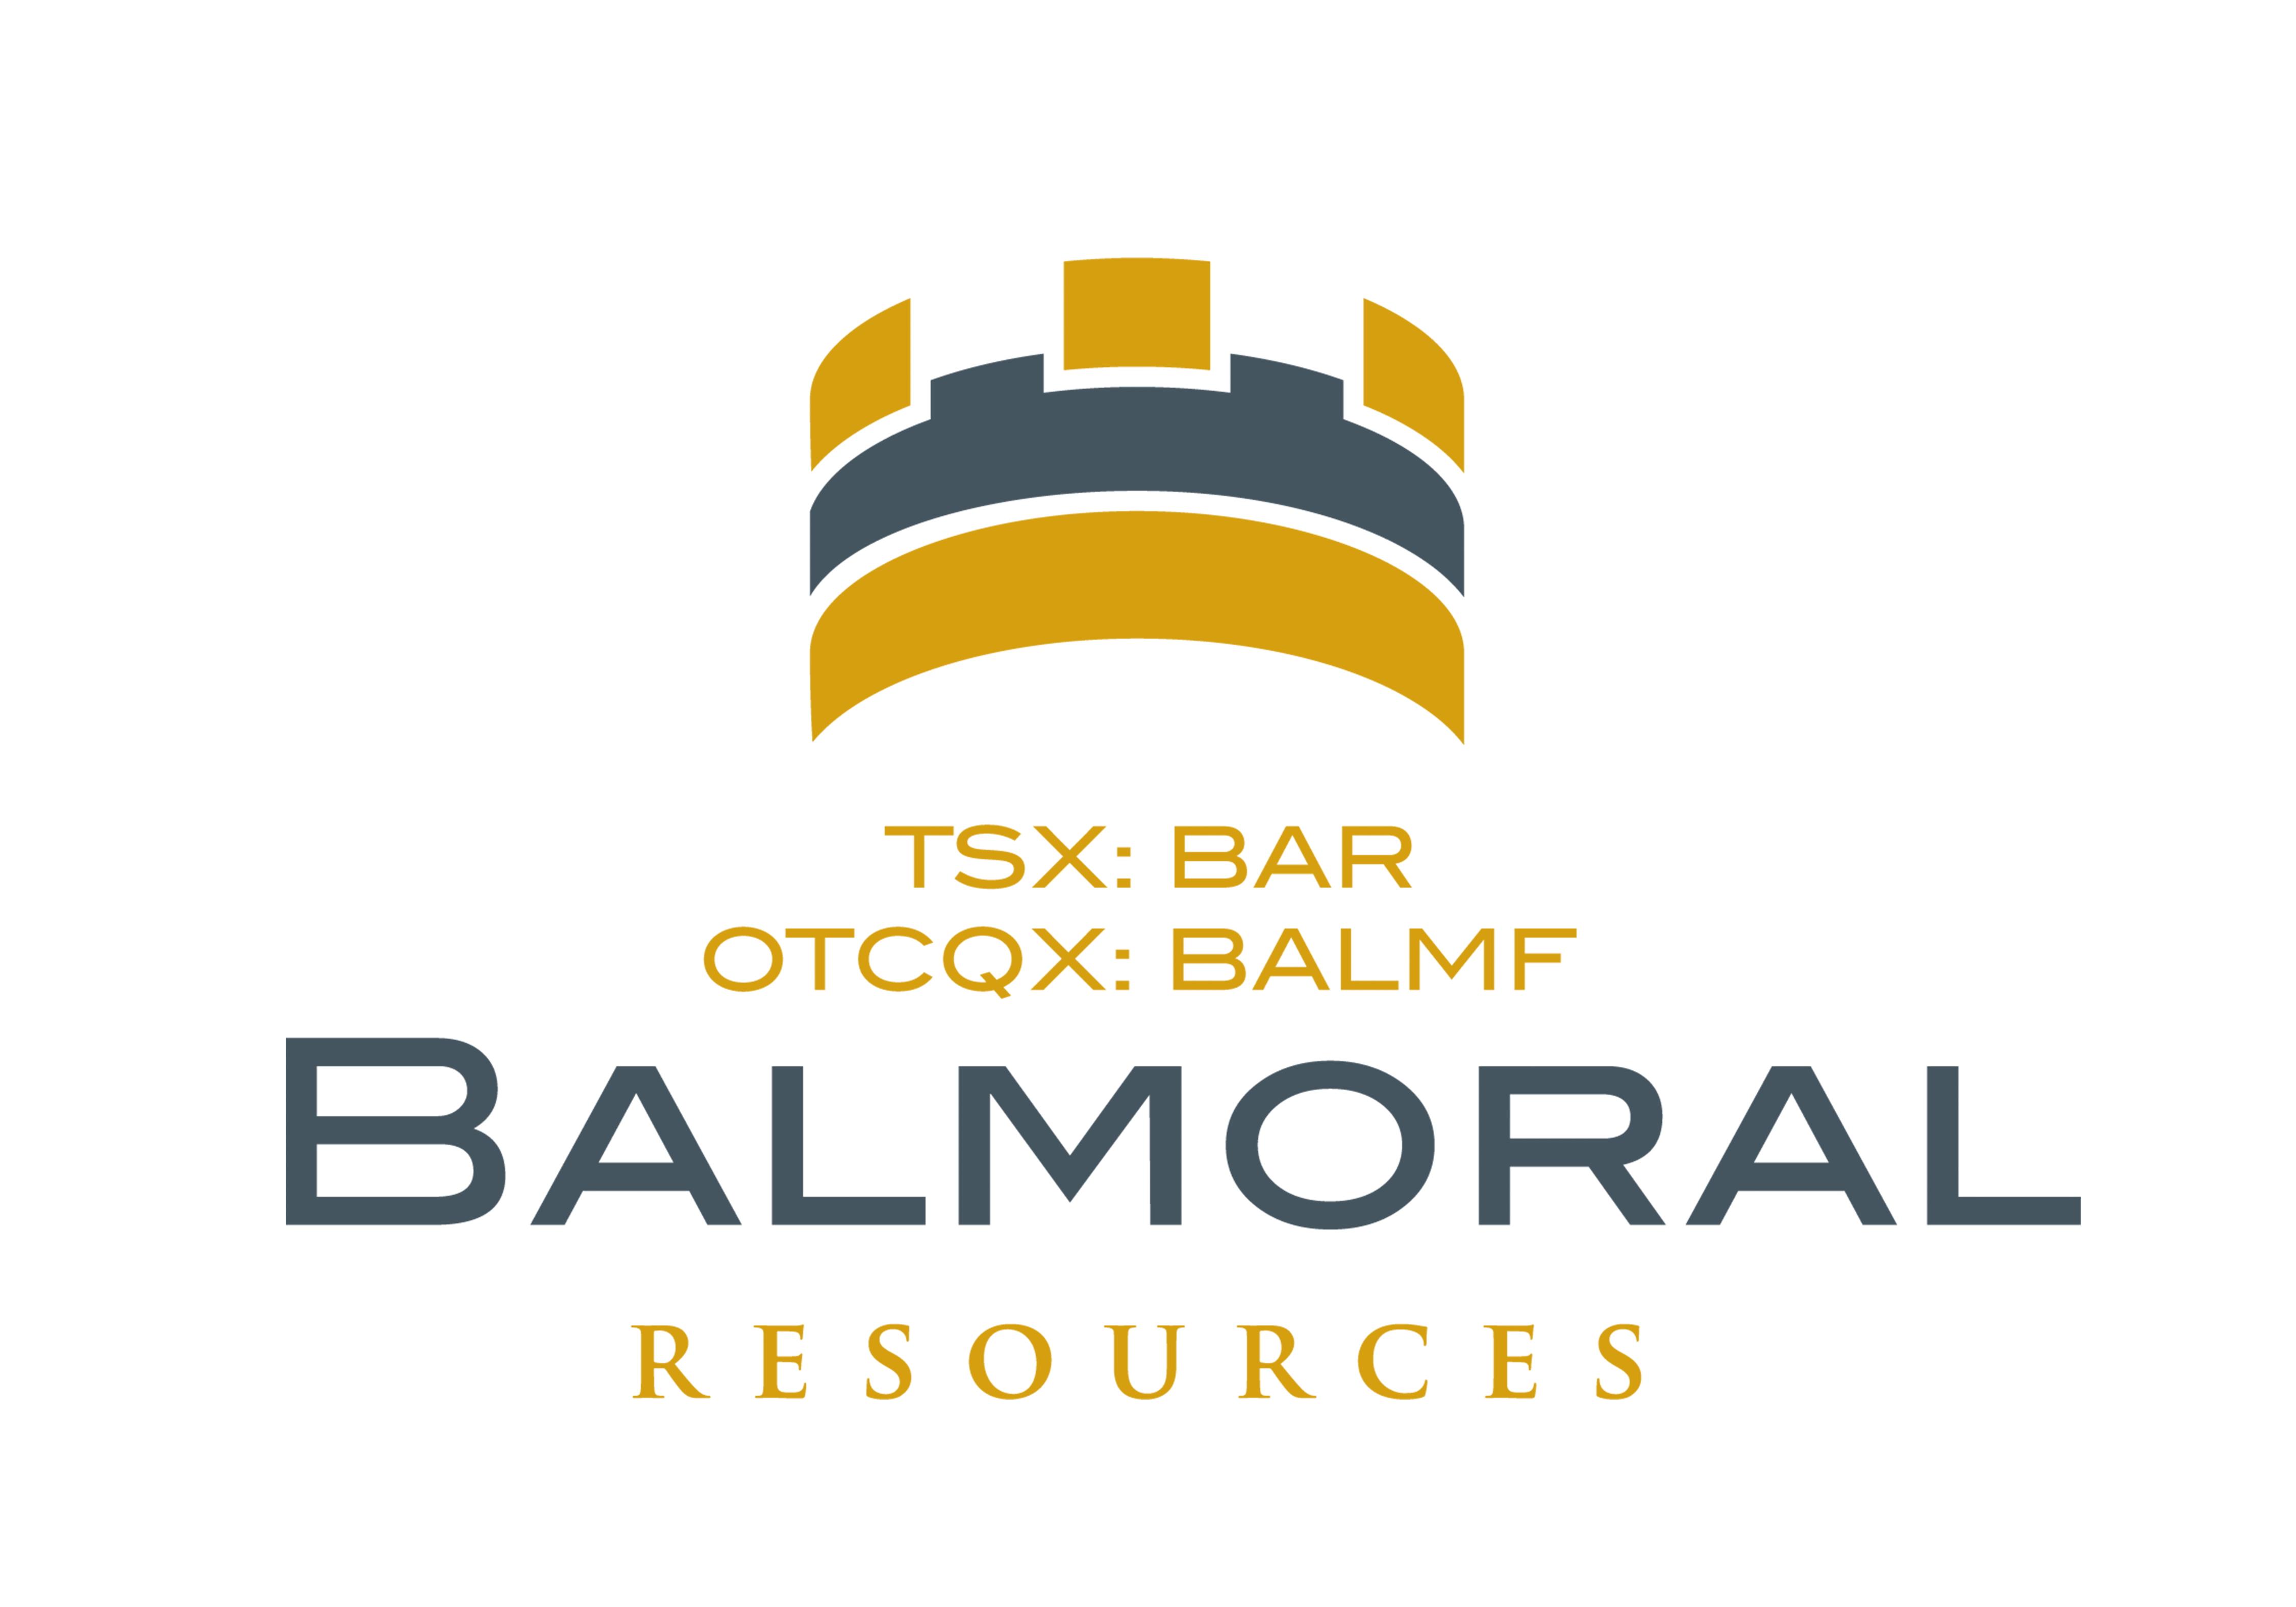 Balmoral Resources Ltd